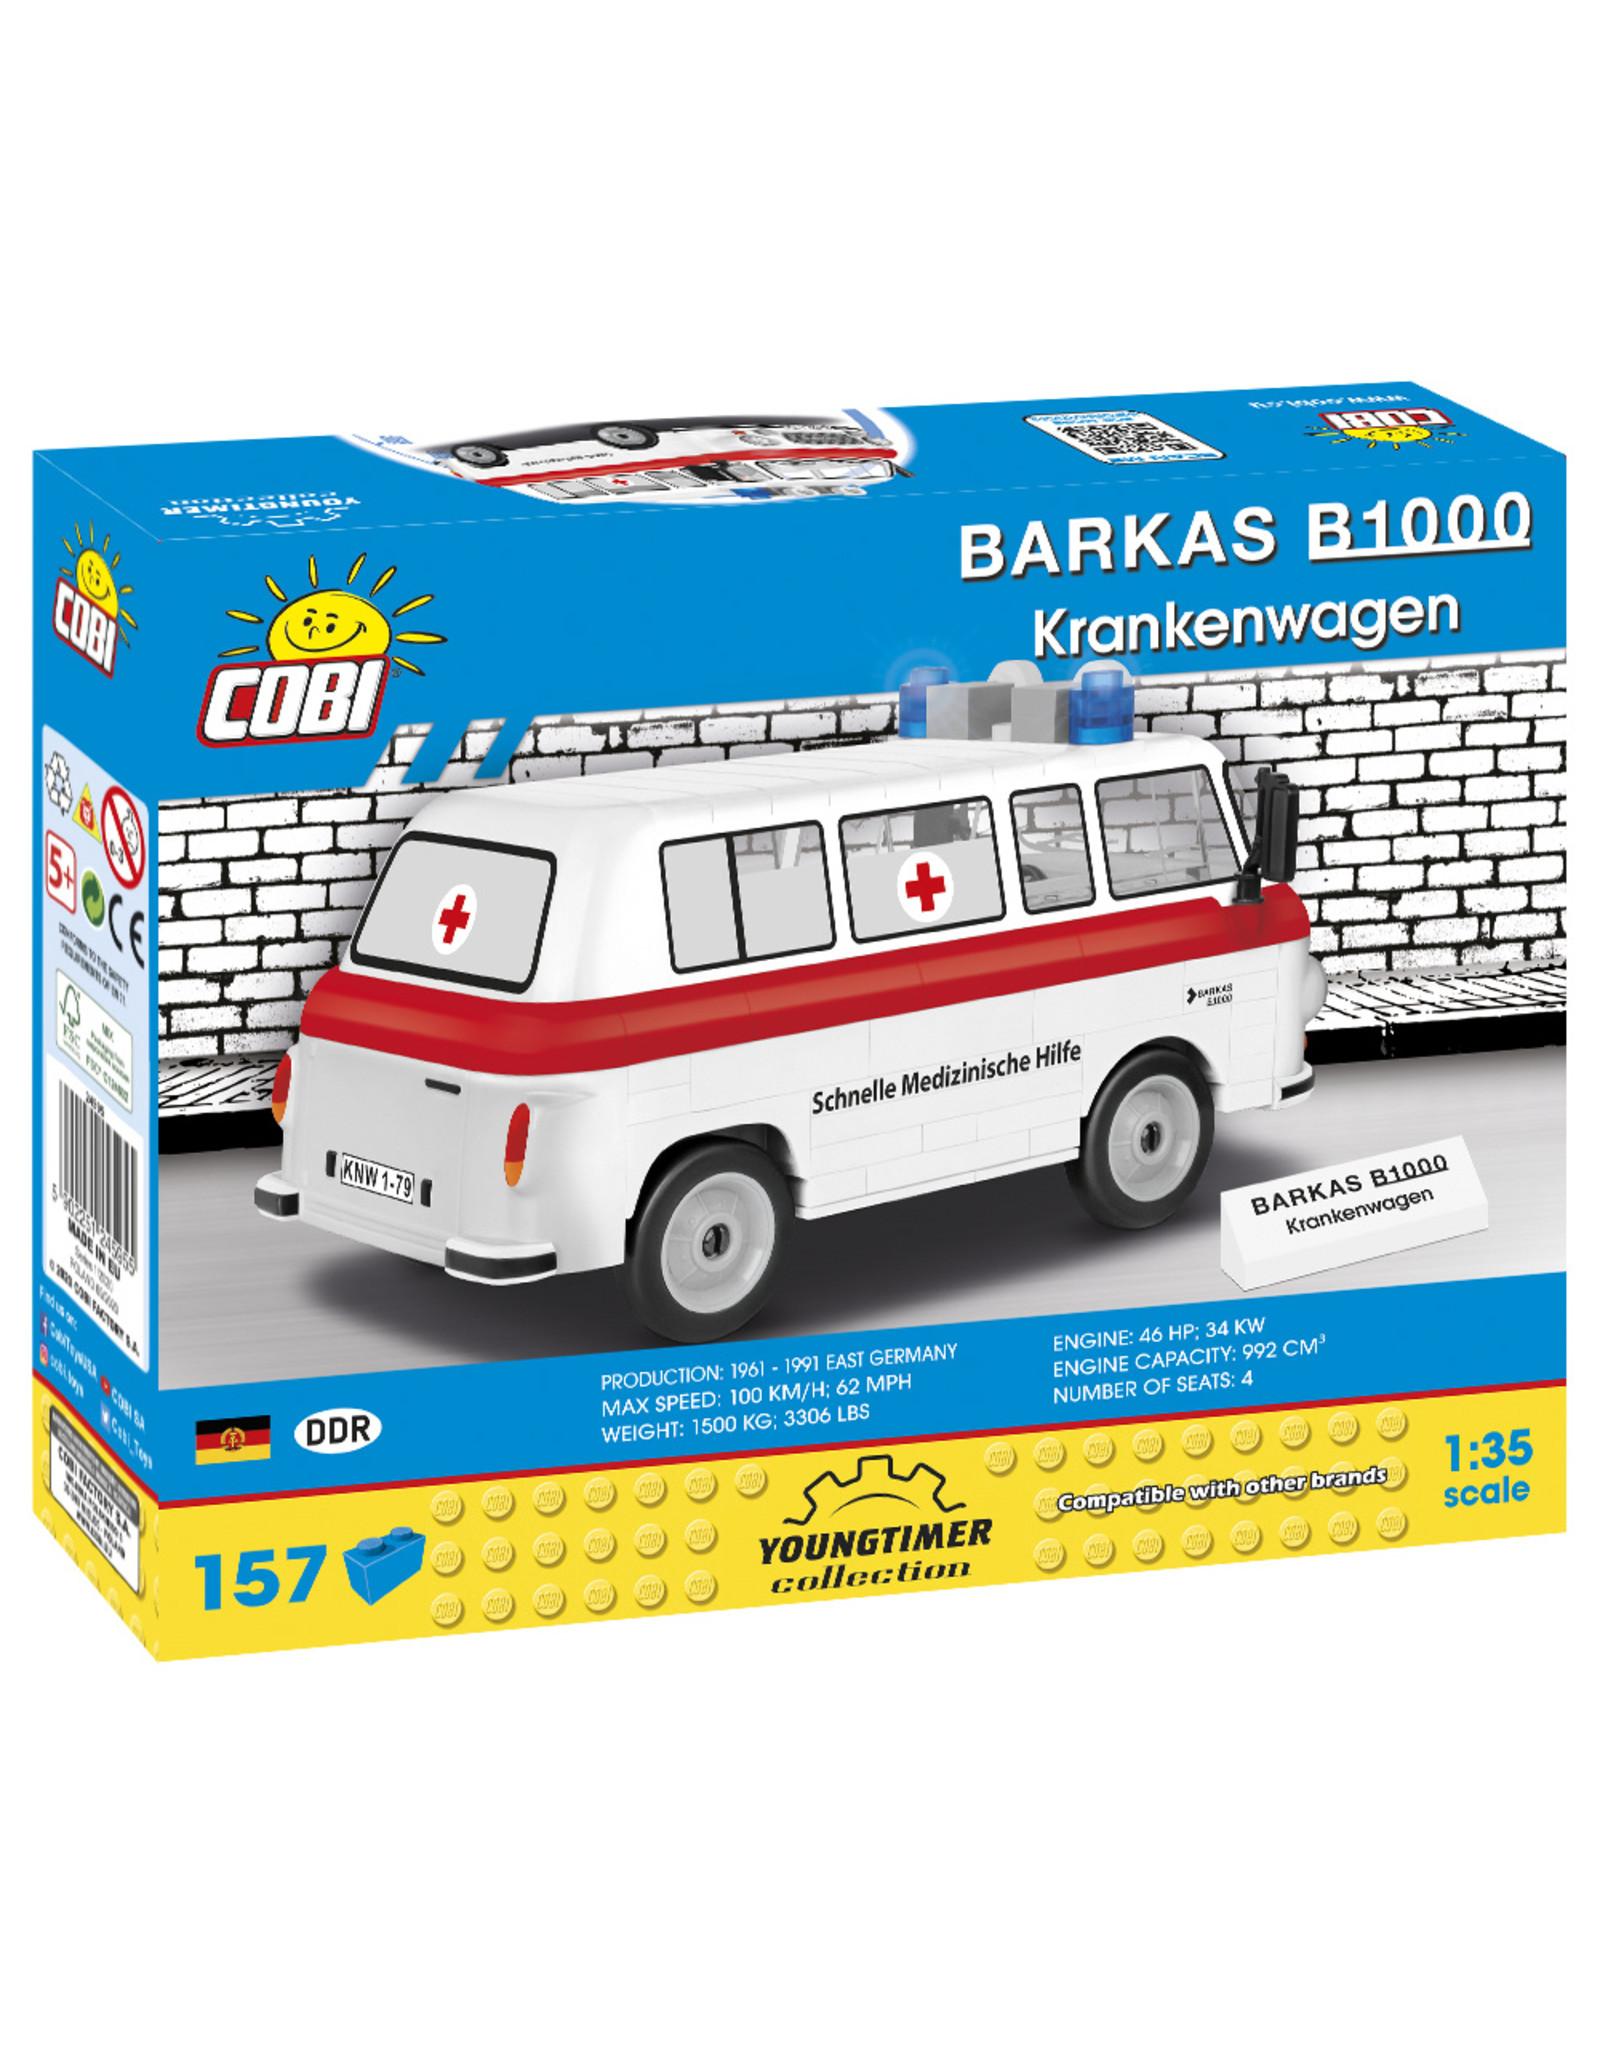 COBI COBI 24595 - Barkas B1000 Krankenwagen